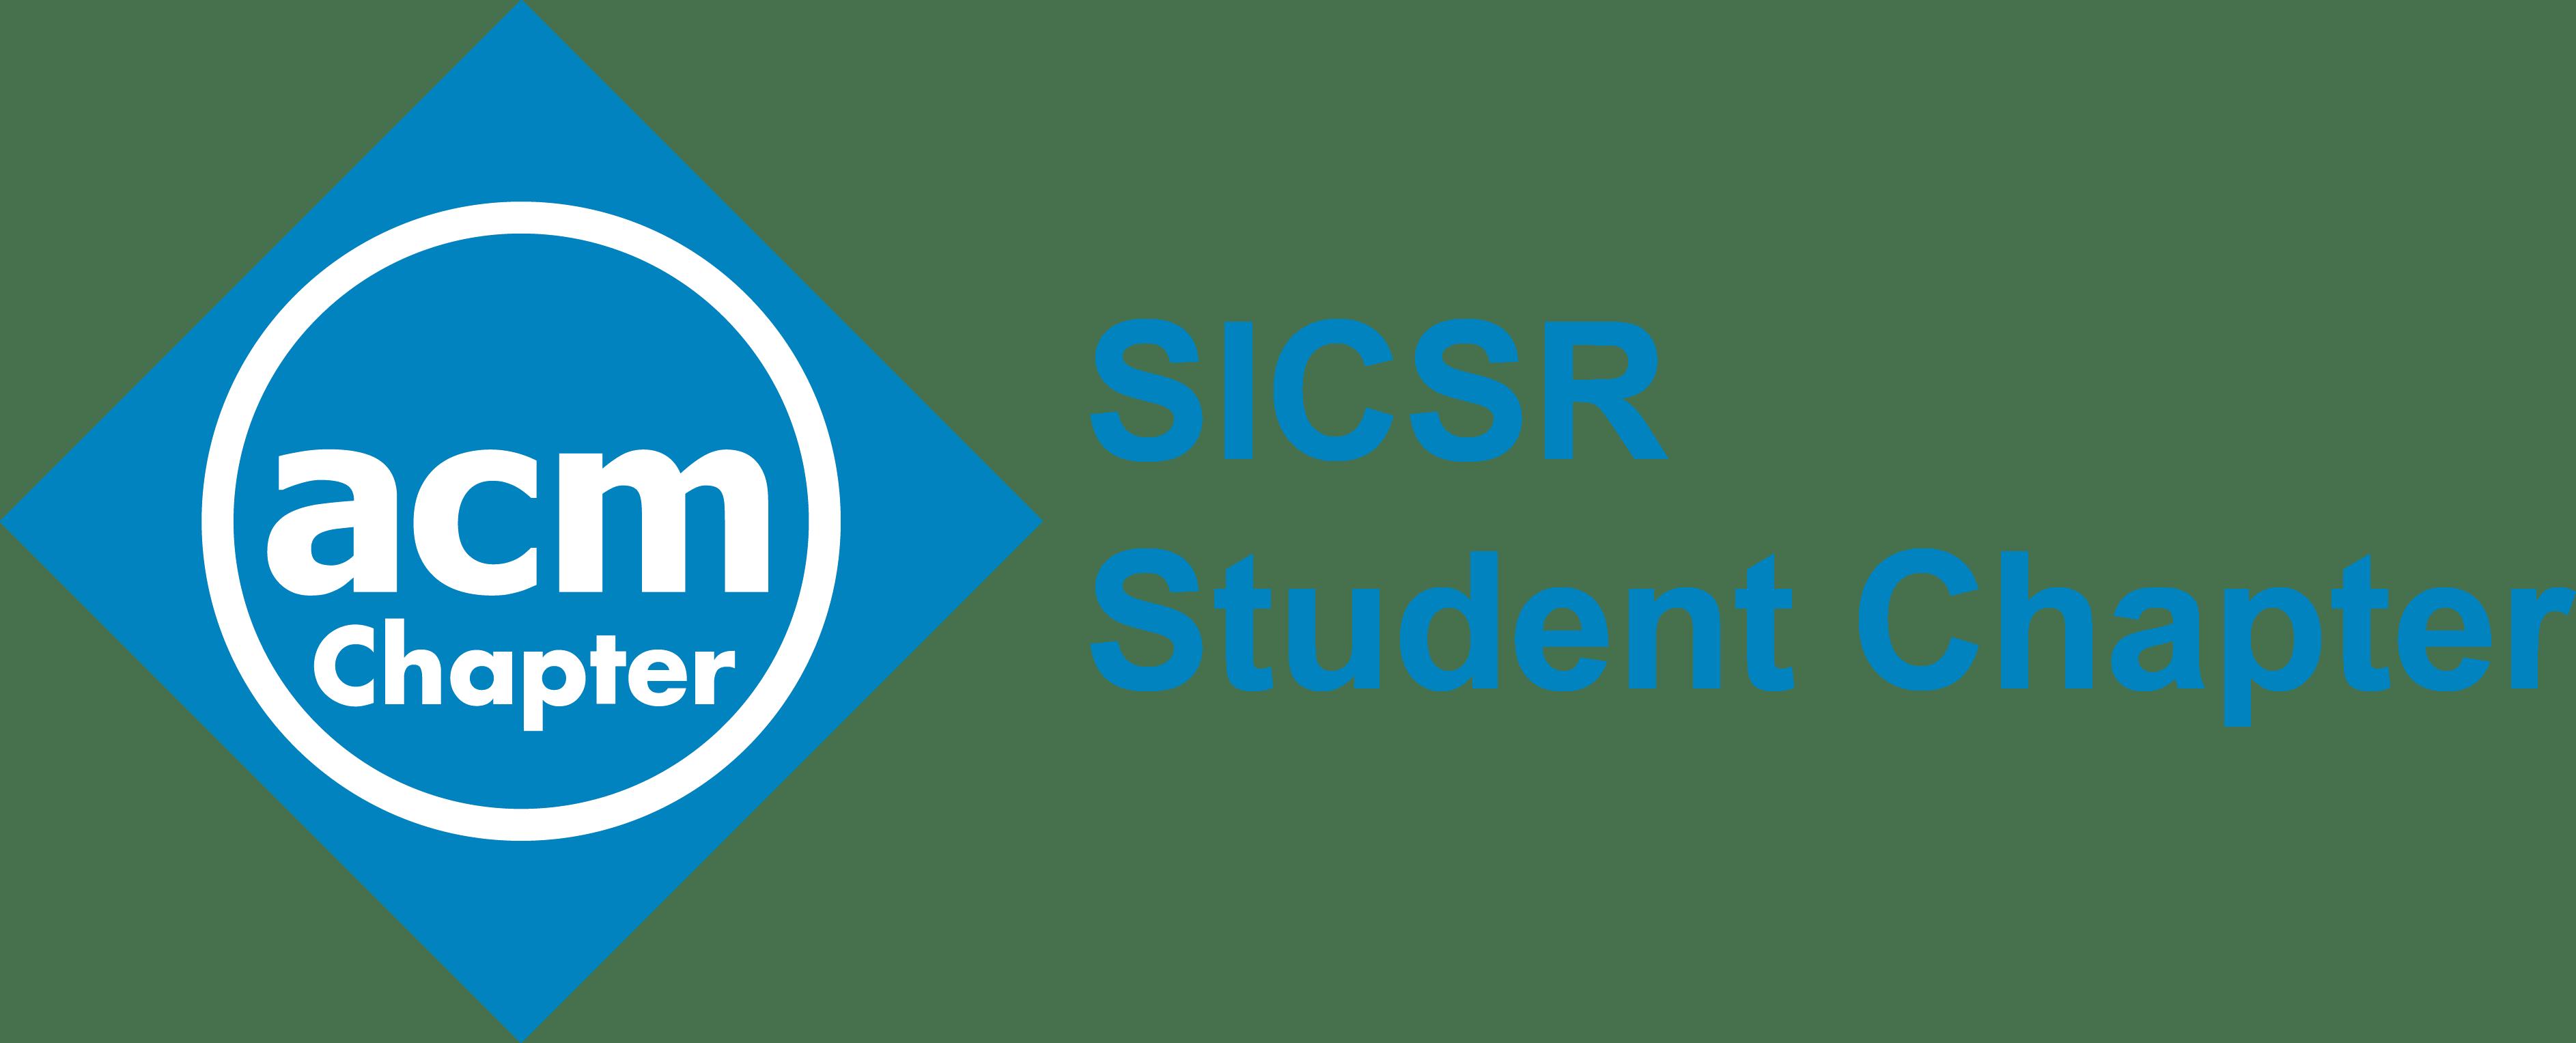 ACM – SICSR